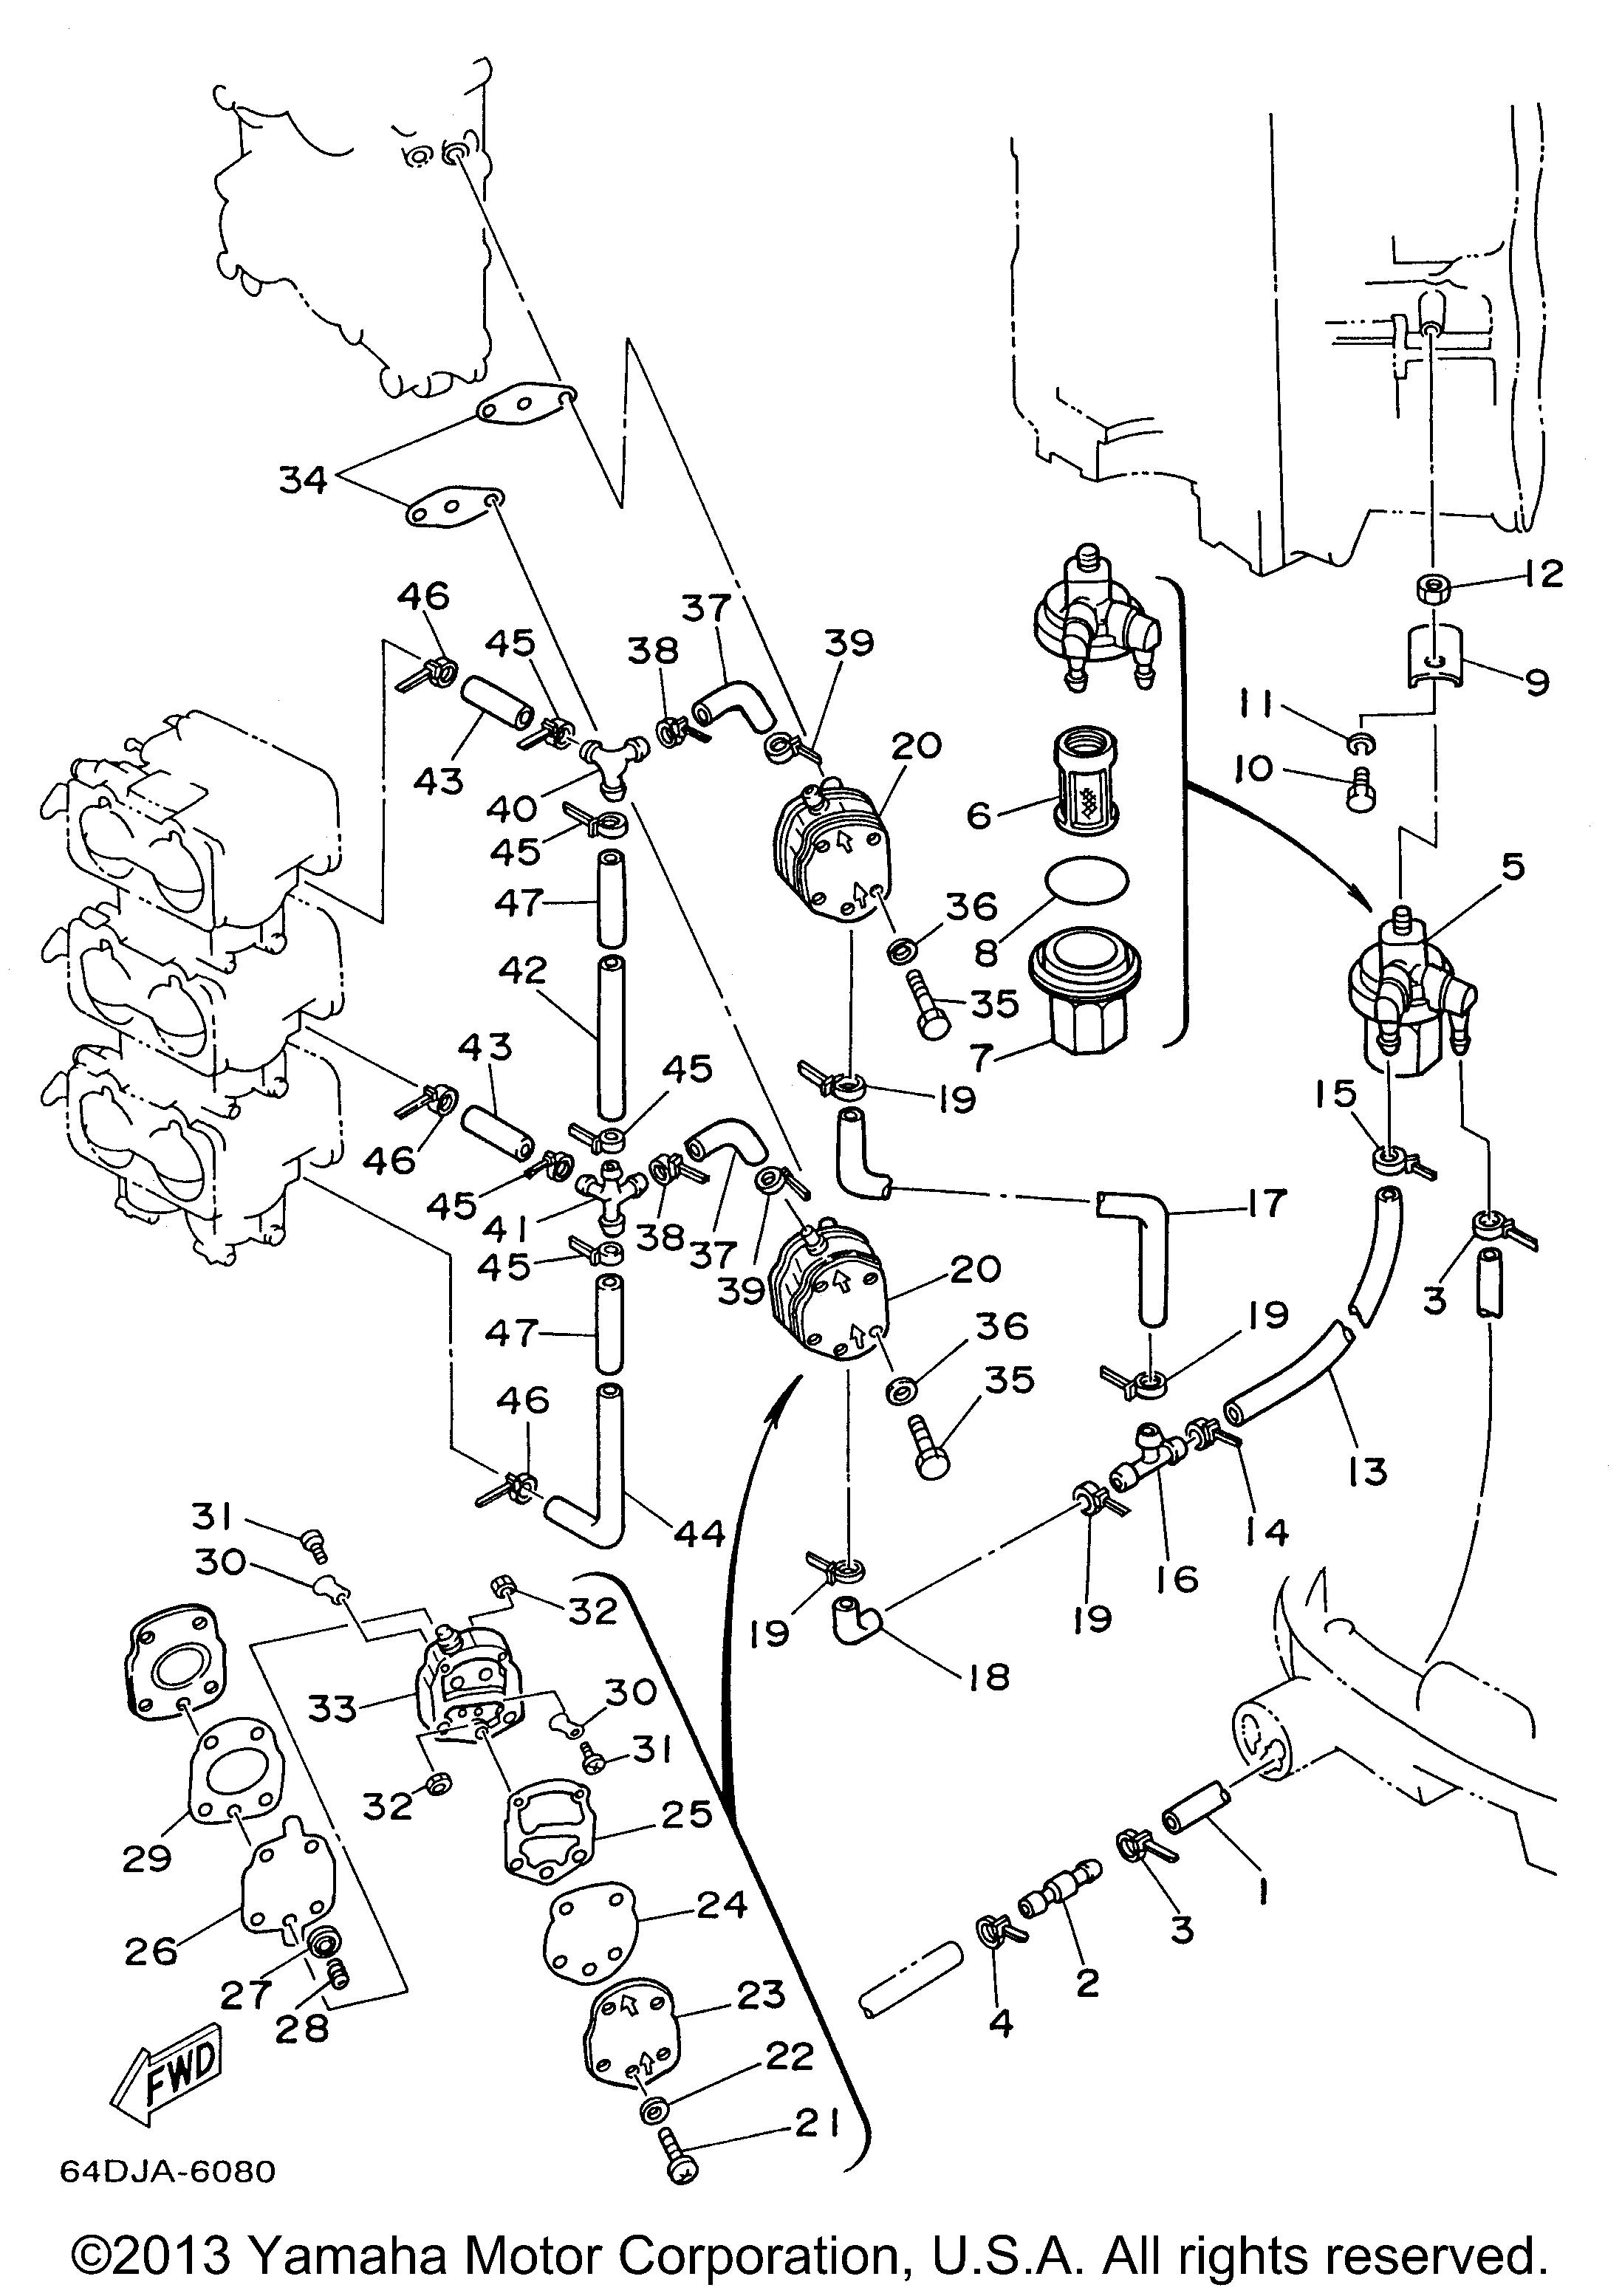 Yamaha | OUTBOARD | 150 HP | S150TXRX | FUEL 1 - Yamaha Outboard